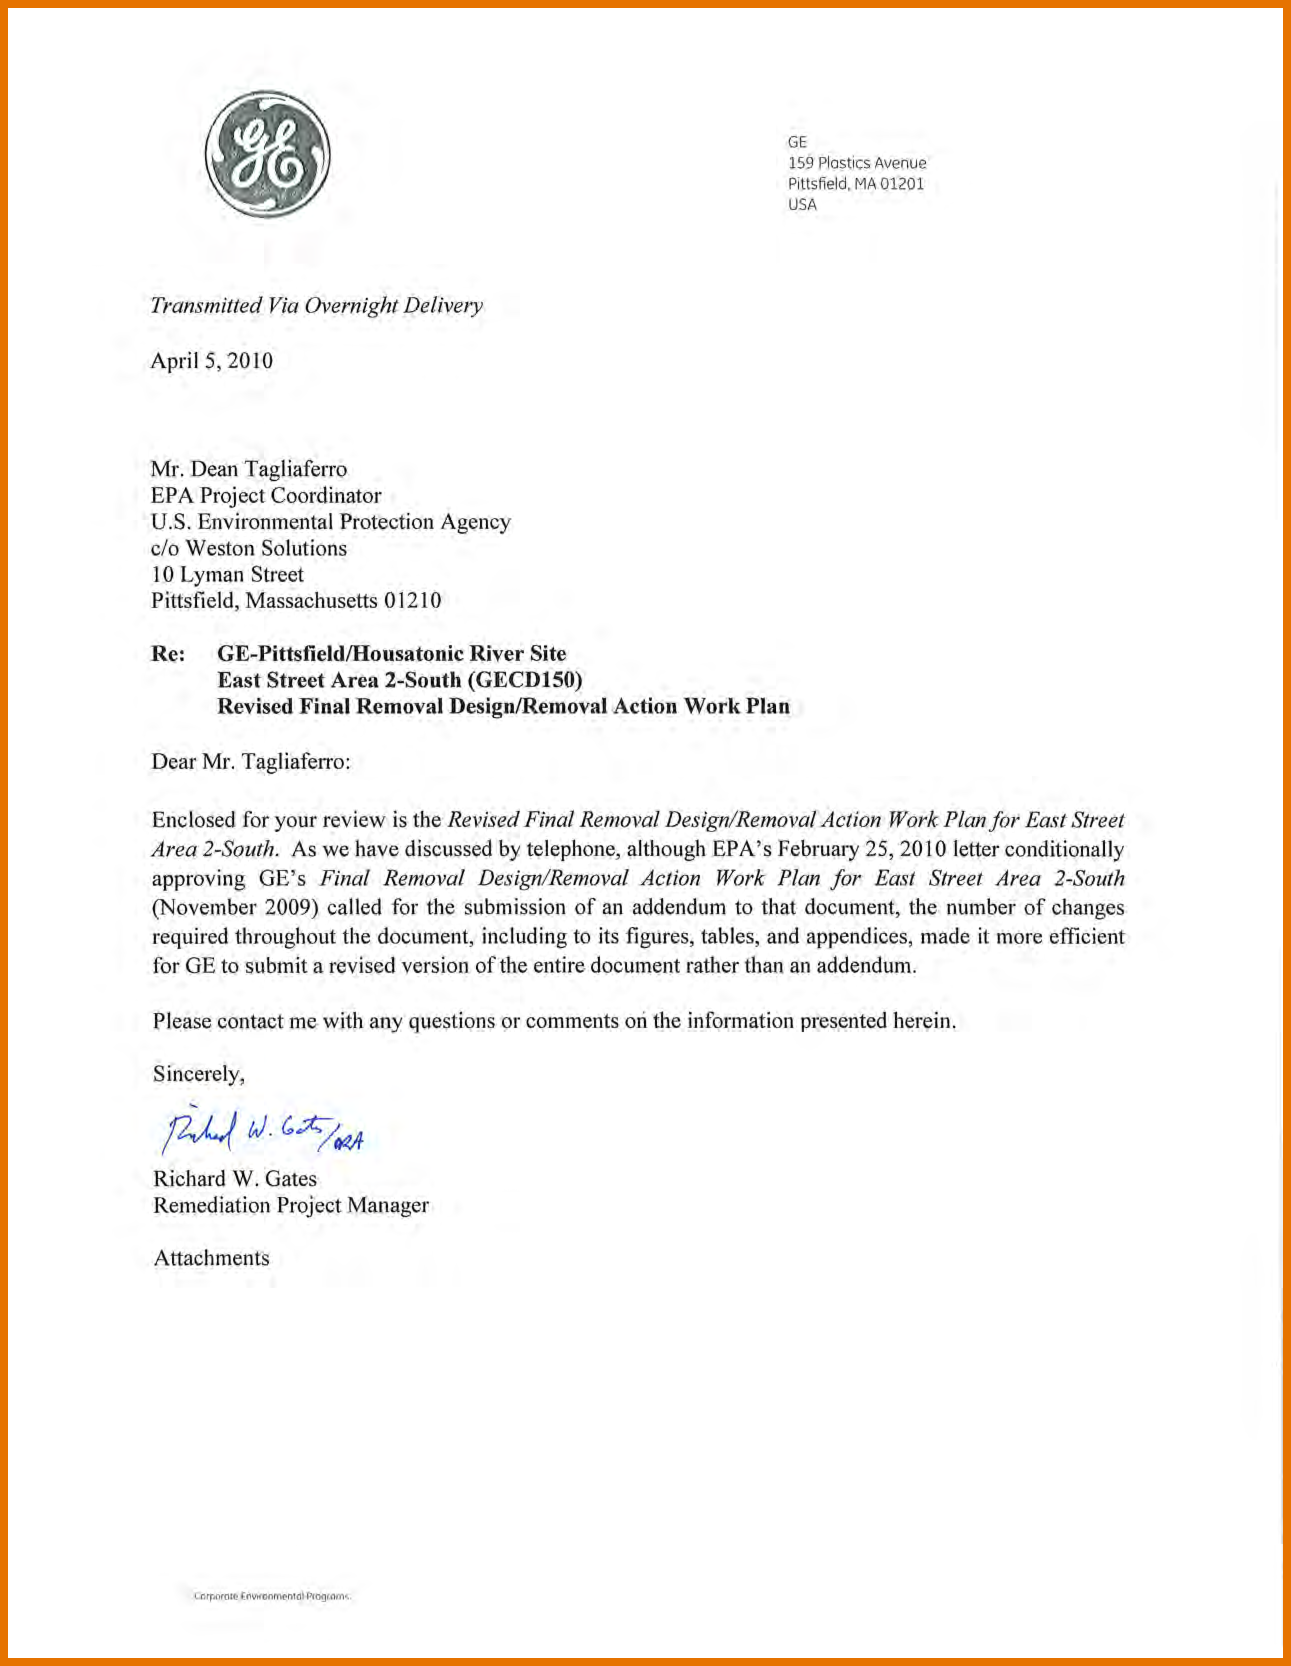 Industrial attachment letter sample attendance sheet download with industrial attachment letter sample attendance sheet download with enclosure business wnxpil spiritdancerdesigns Choice Image